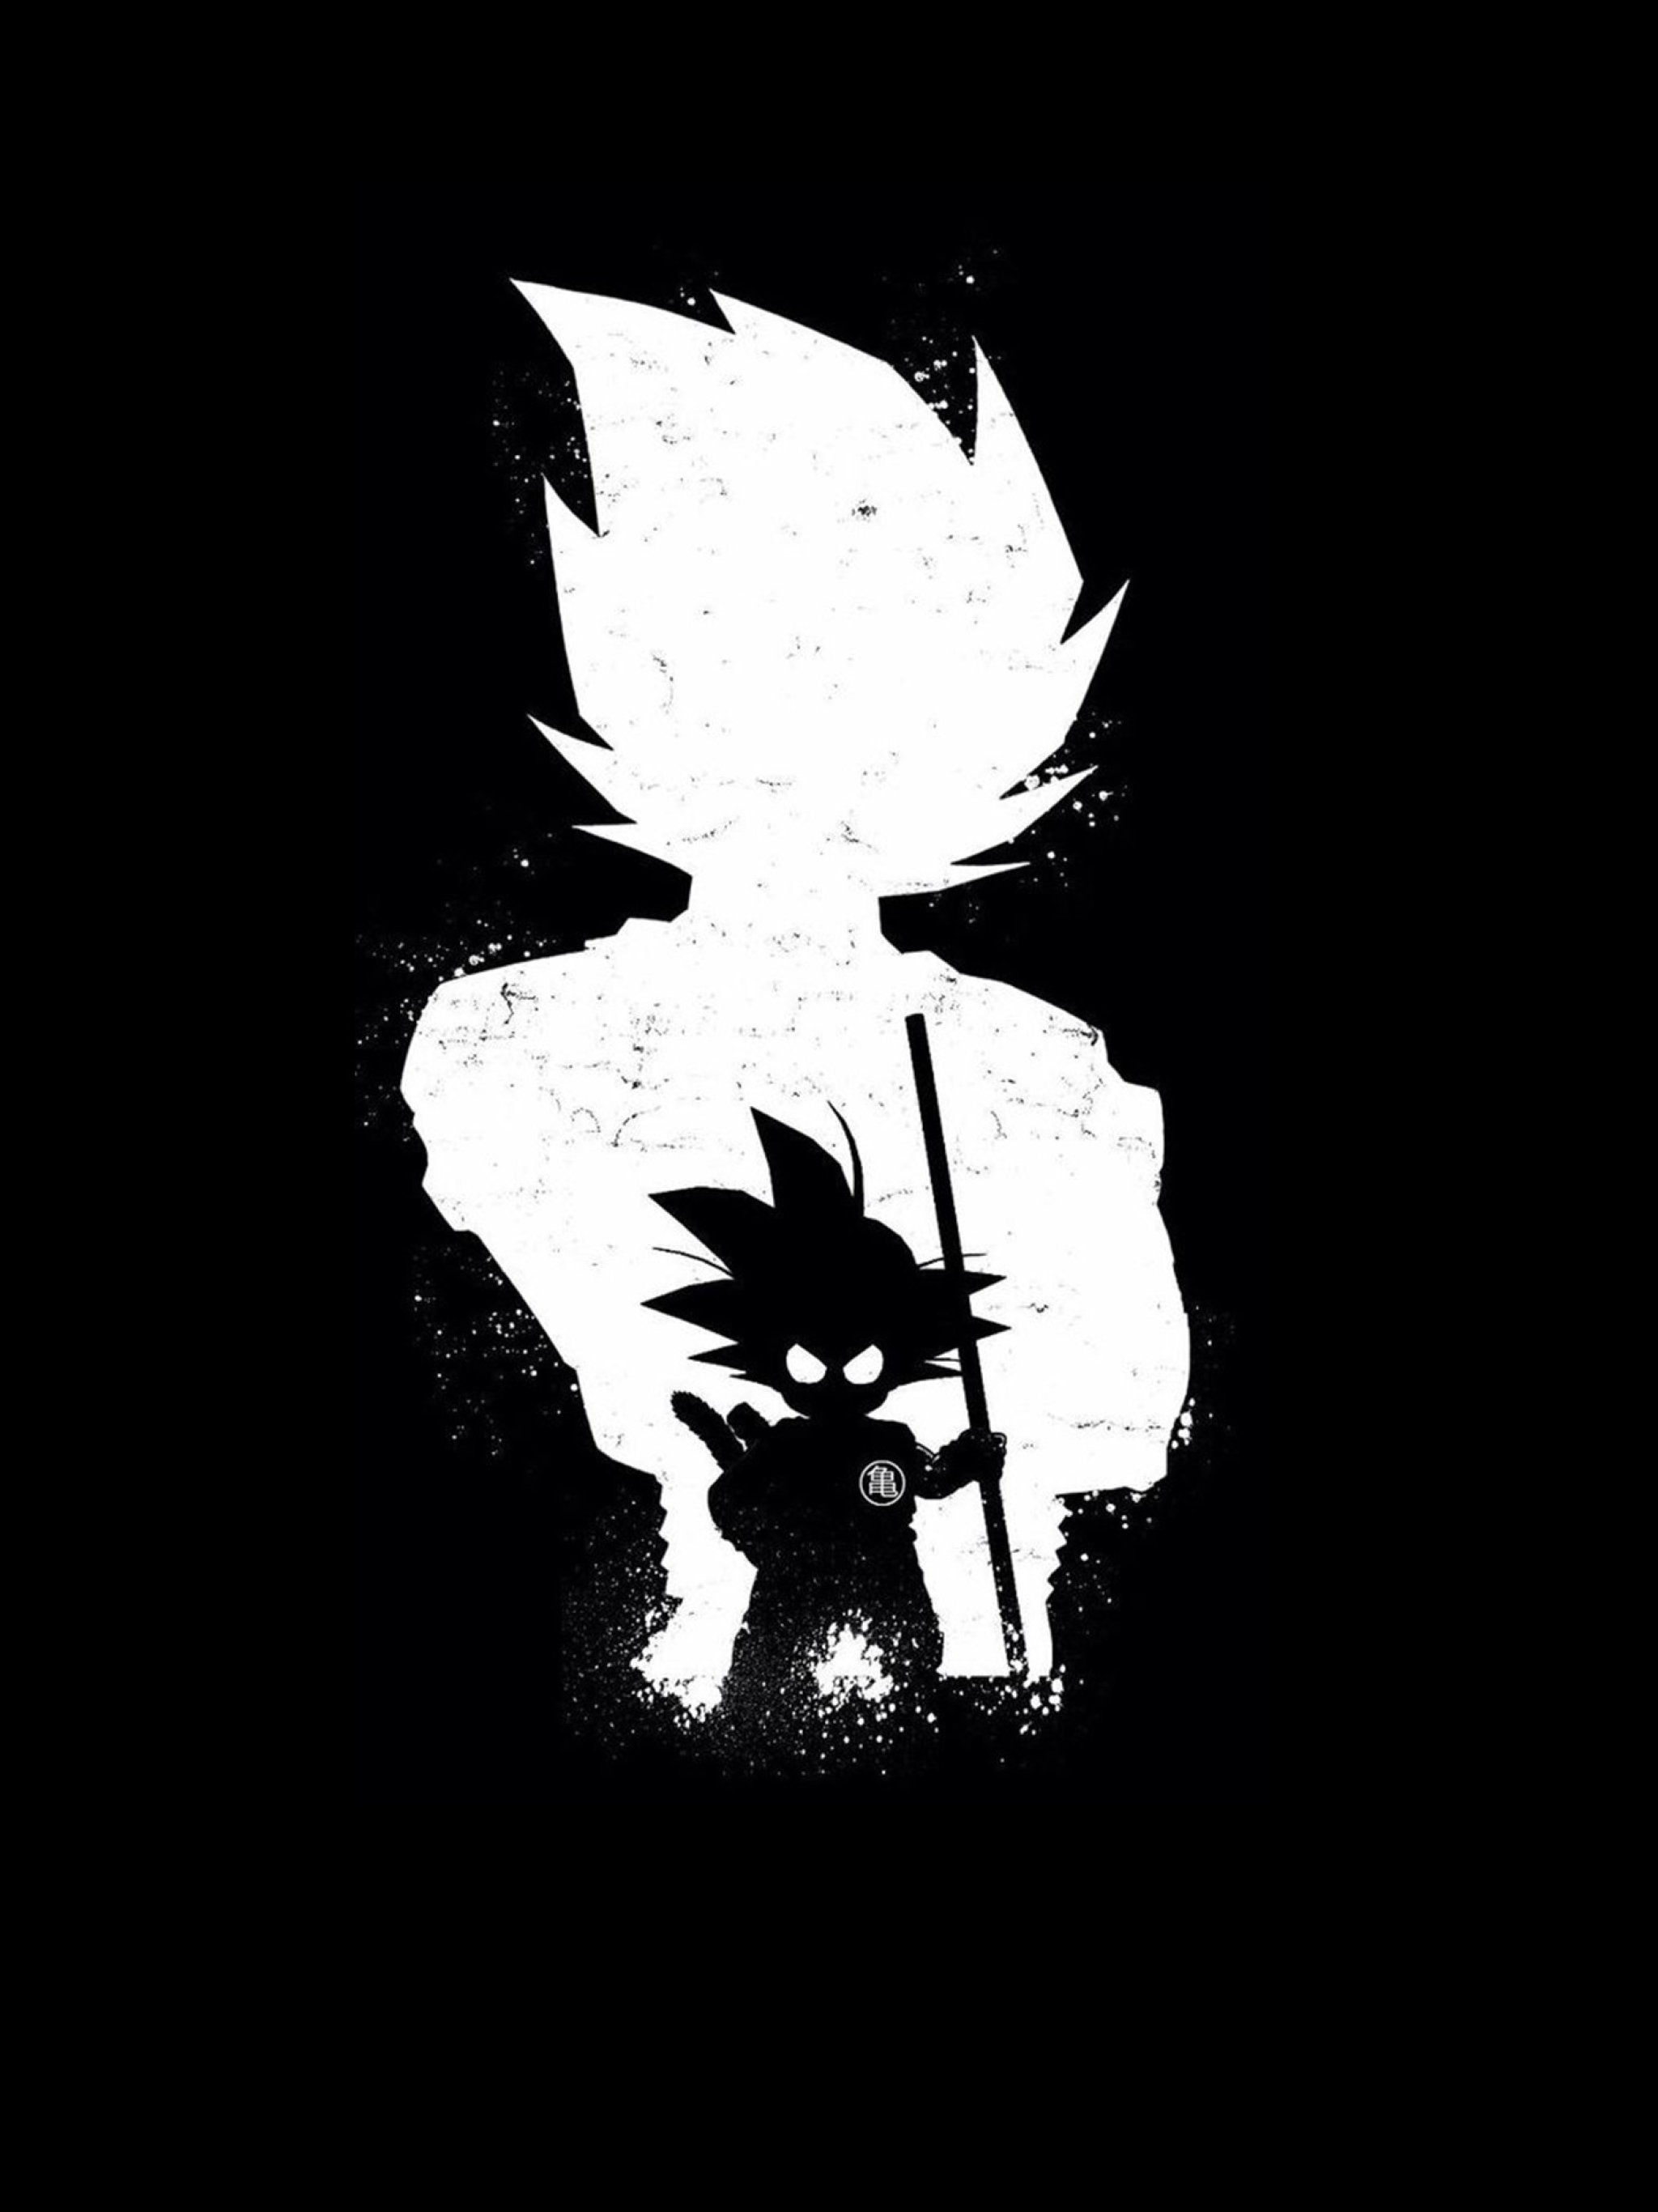 2048x2732 Goku Anime Dark Black 2048x2732 Resolution Wallpaper Hd